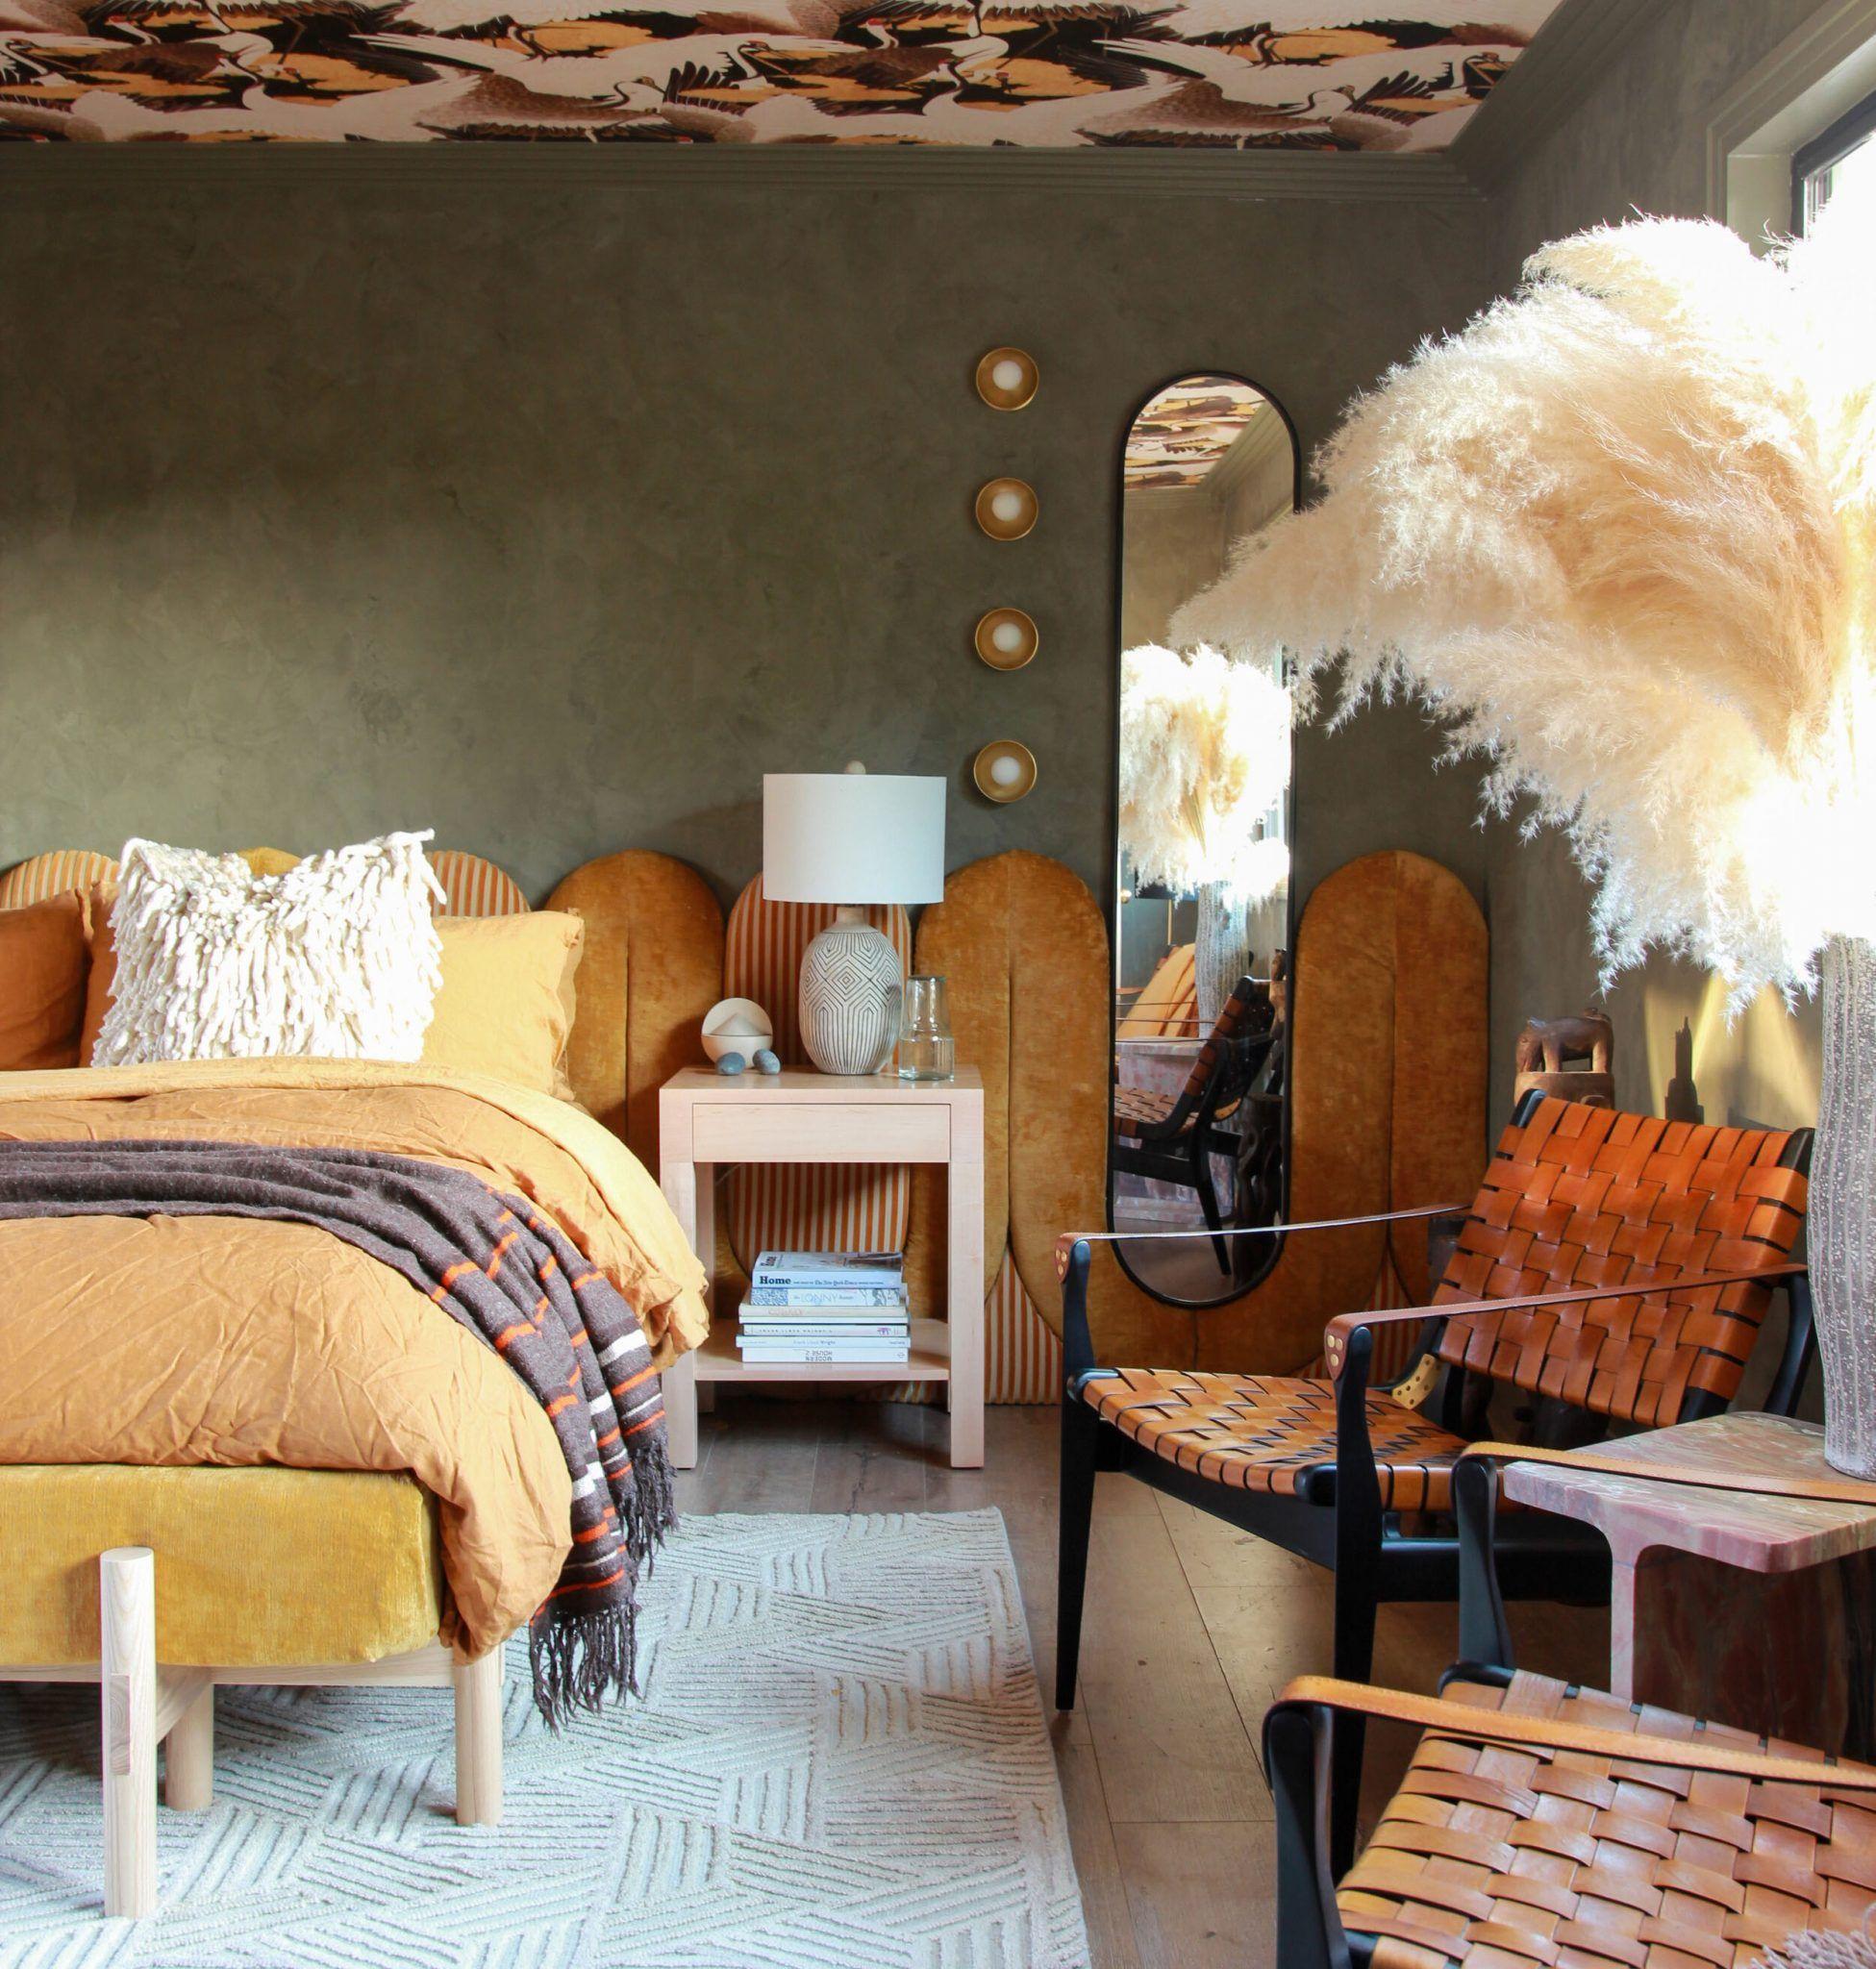 The 15 Best Bedroom Paint Colors That Aren't White Best